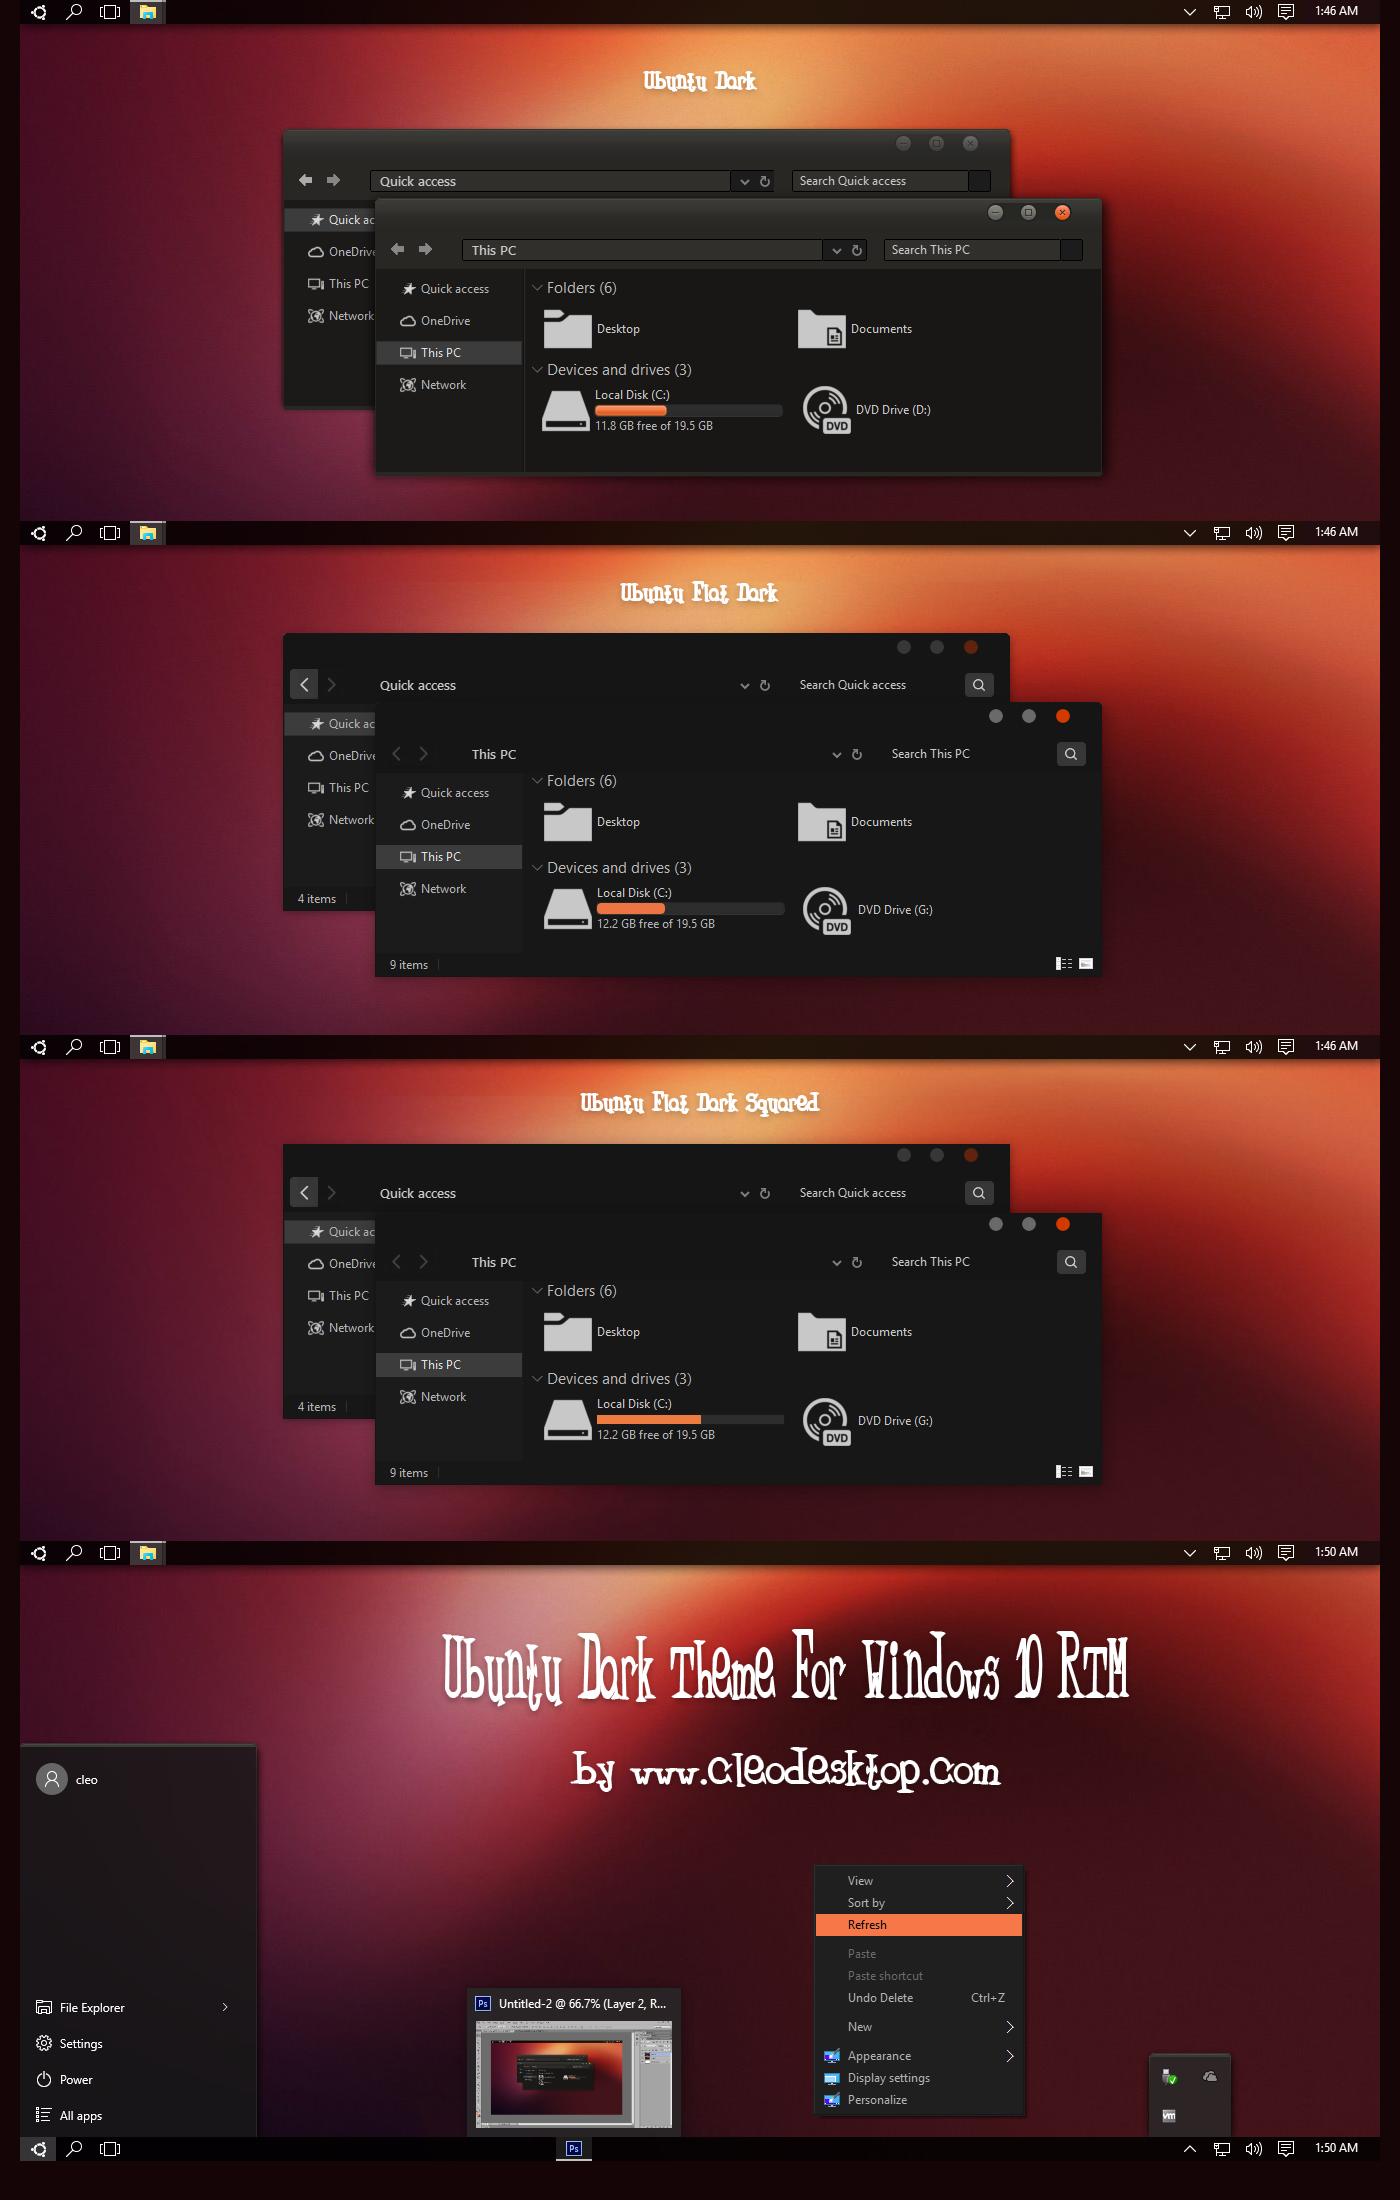 Ubuntu Dark Theme For Windows 10 RTM by cu88